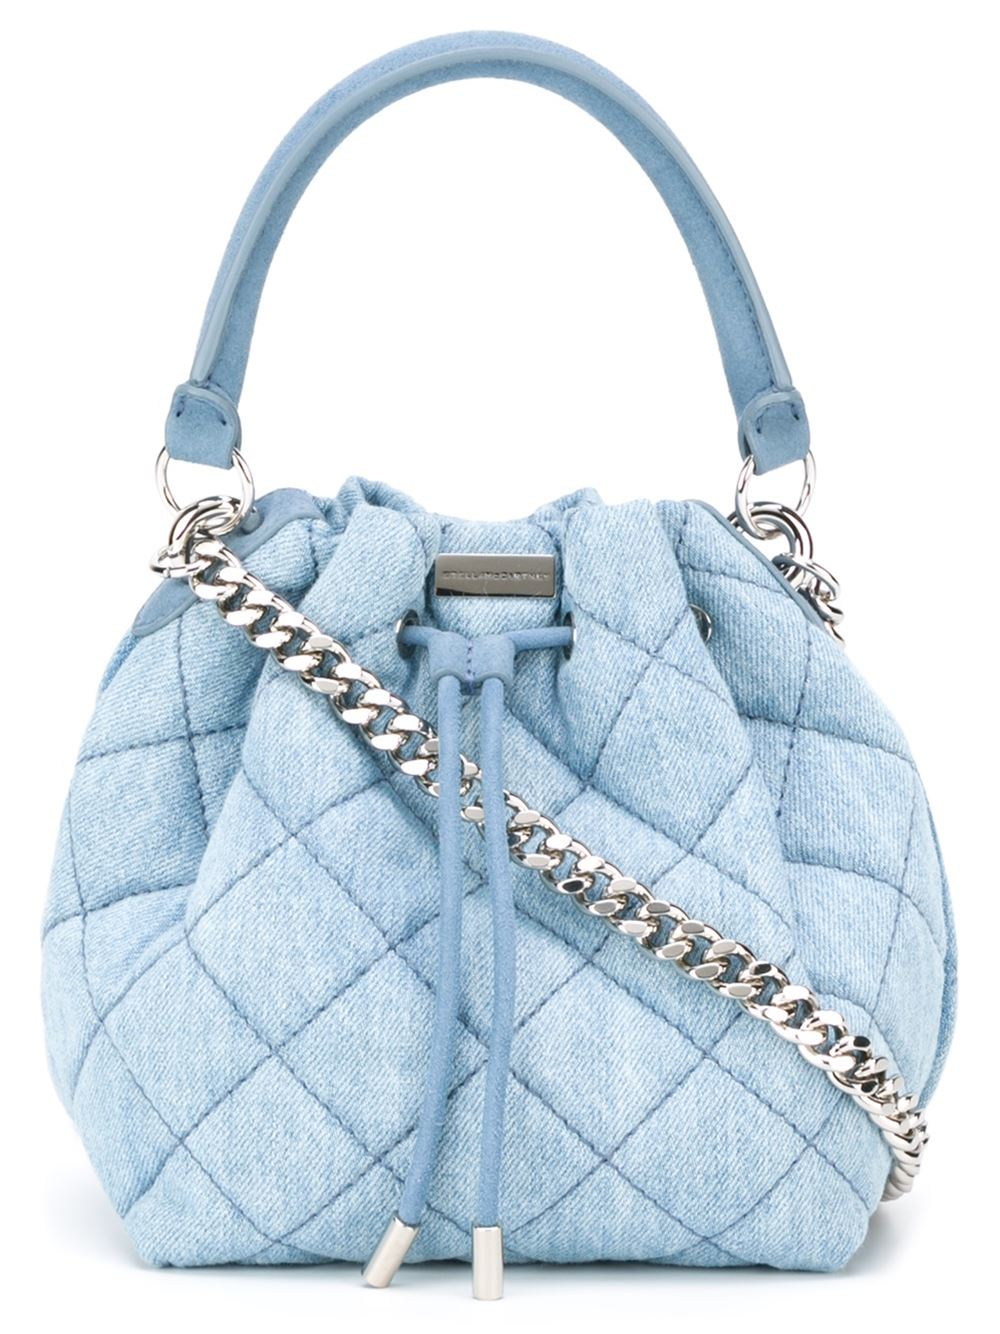 lyst stella mccartney matelasse bucket bag in blue. Black Bedroom Furniture Sets. Home Design Ideas